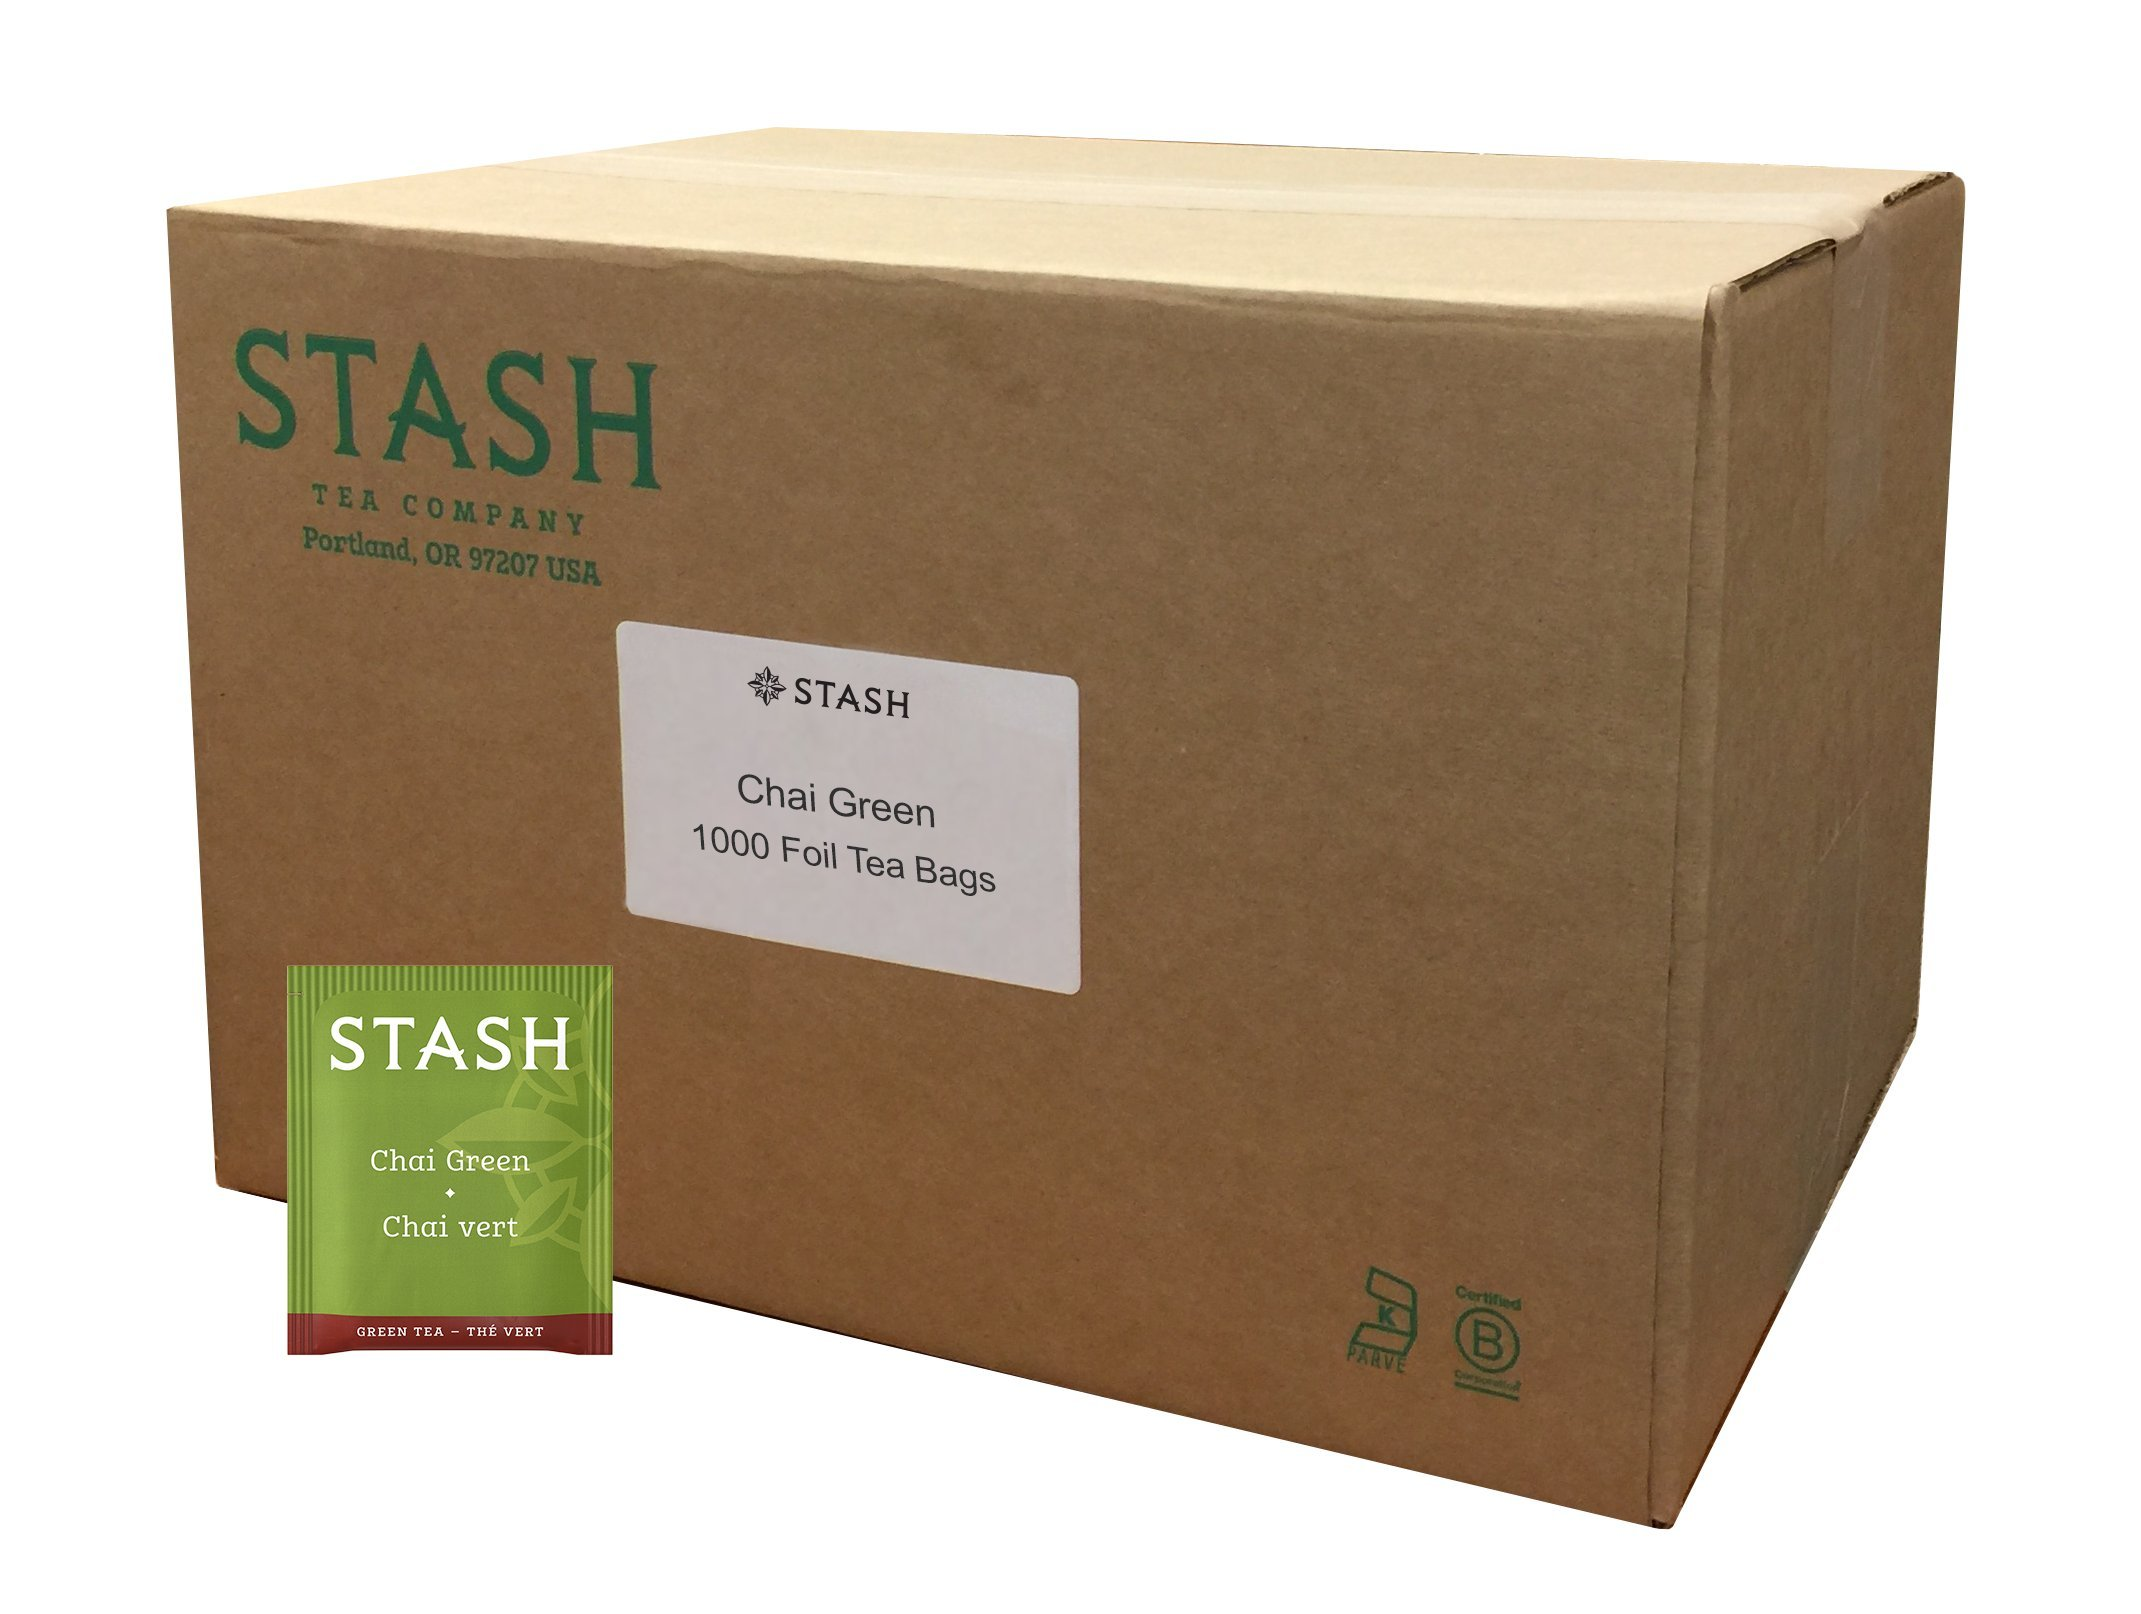 Stash Tea Green Chai Tea 1000 Count Tea Bags in Foil  Individual Spiced Green Tea Bags for Use in Teapots Mugs or Teacups, Brew Hot Tea or Iced Tea, Add Milk for Chai Latte